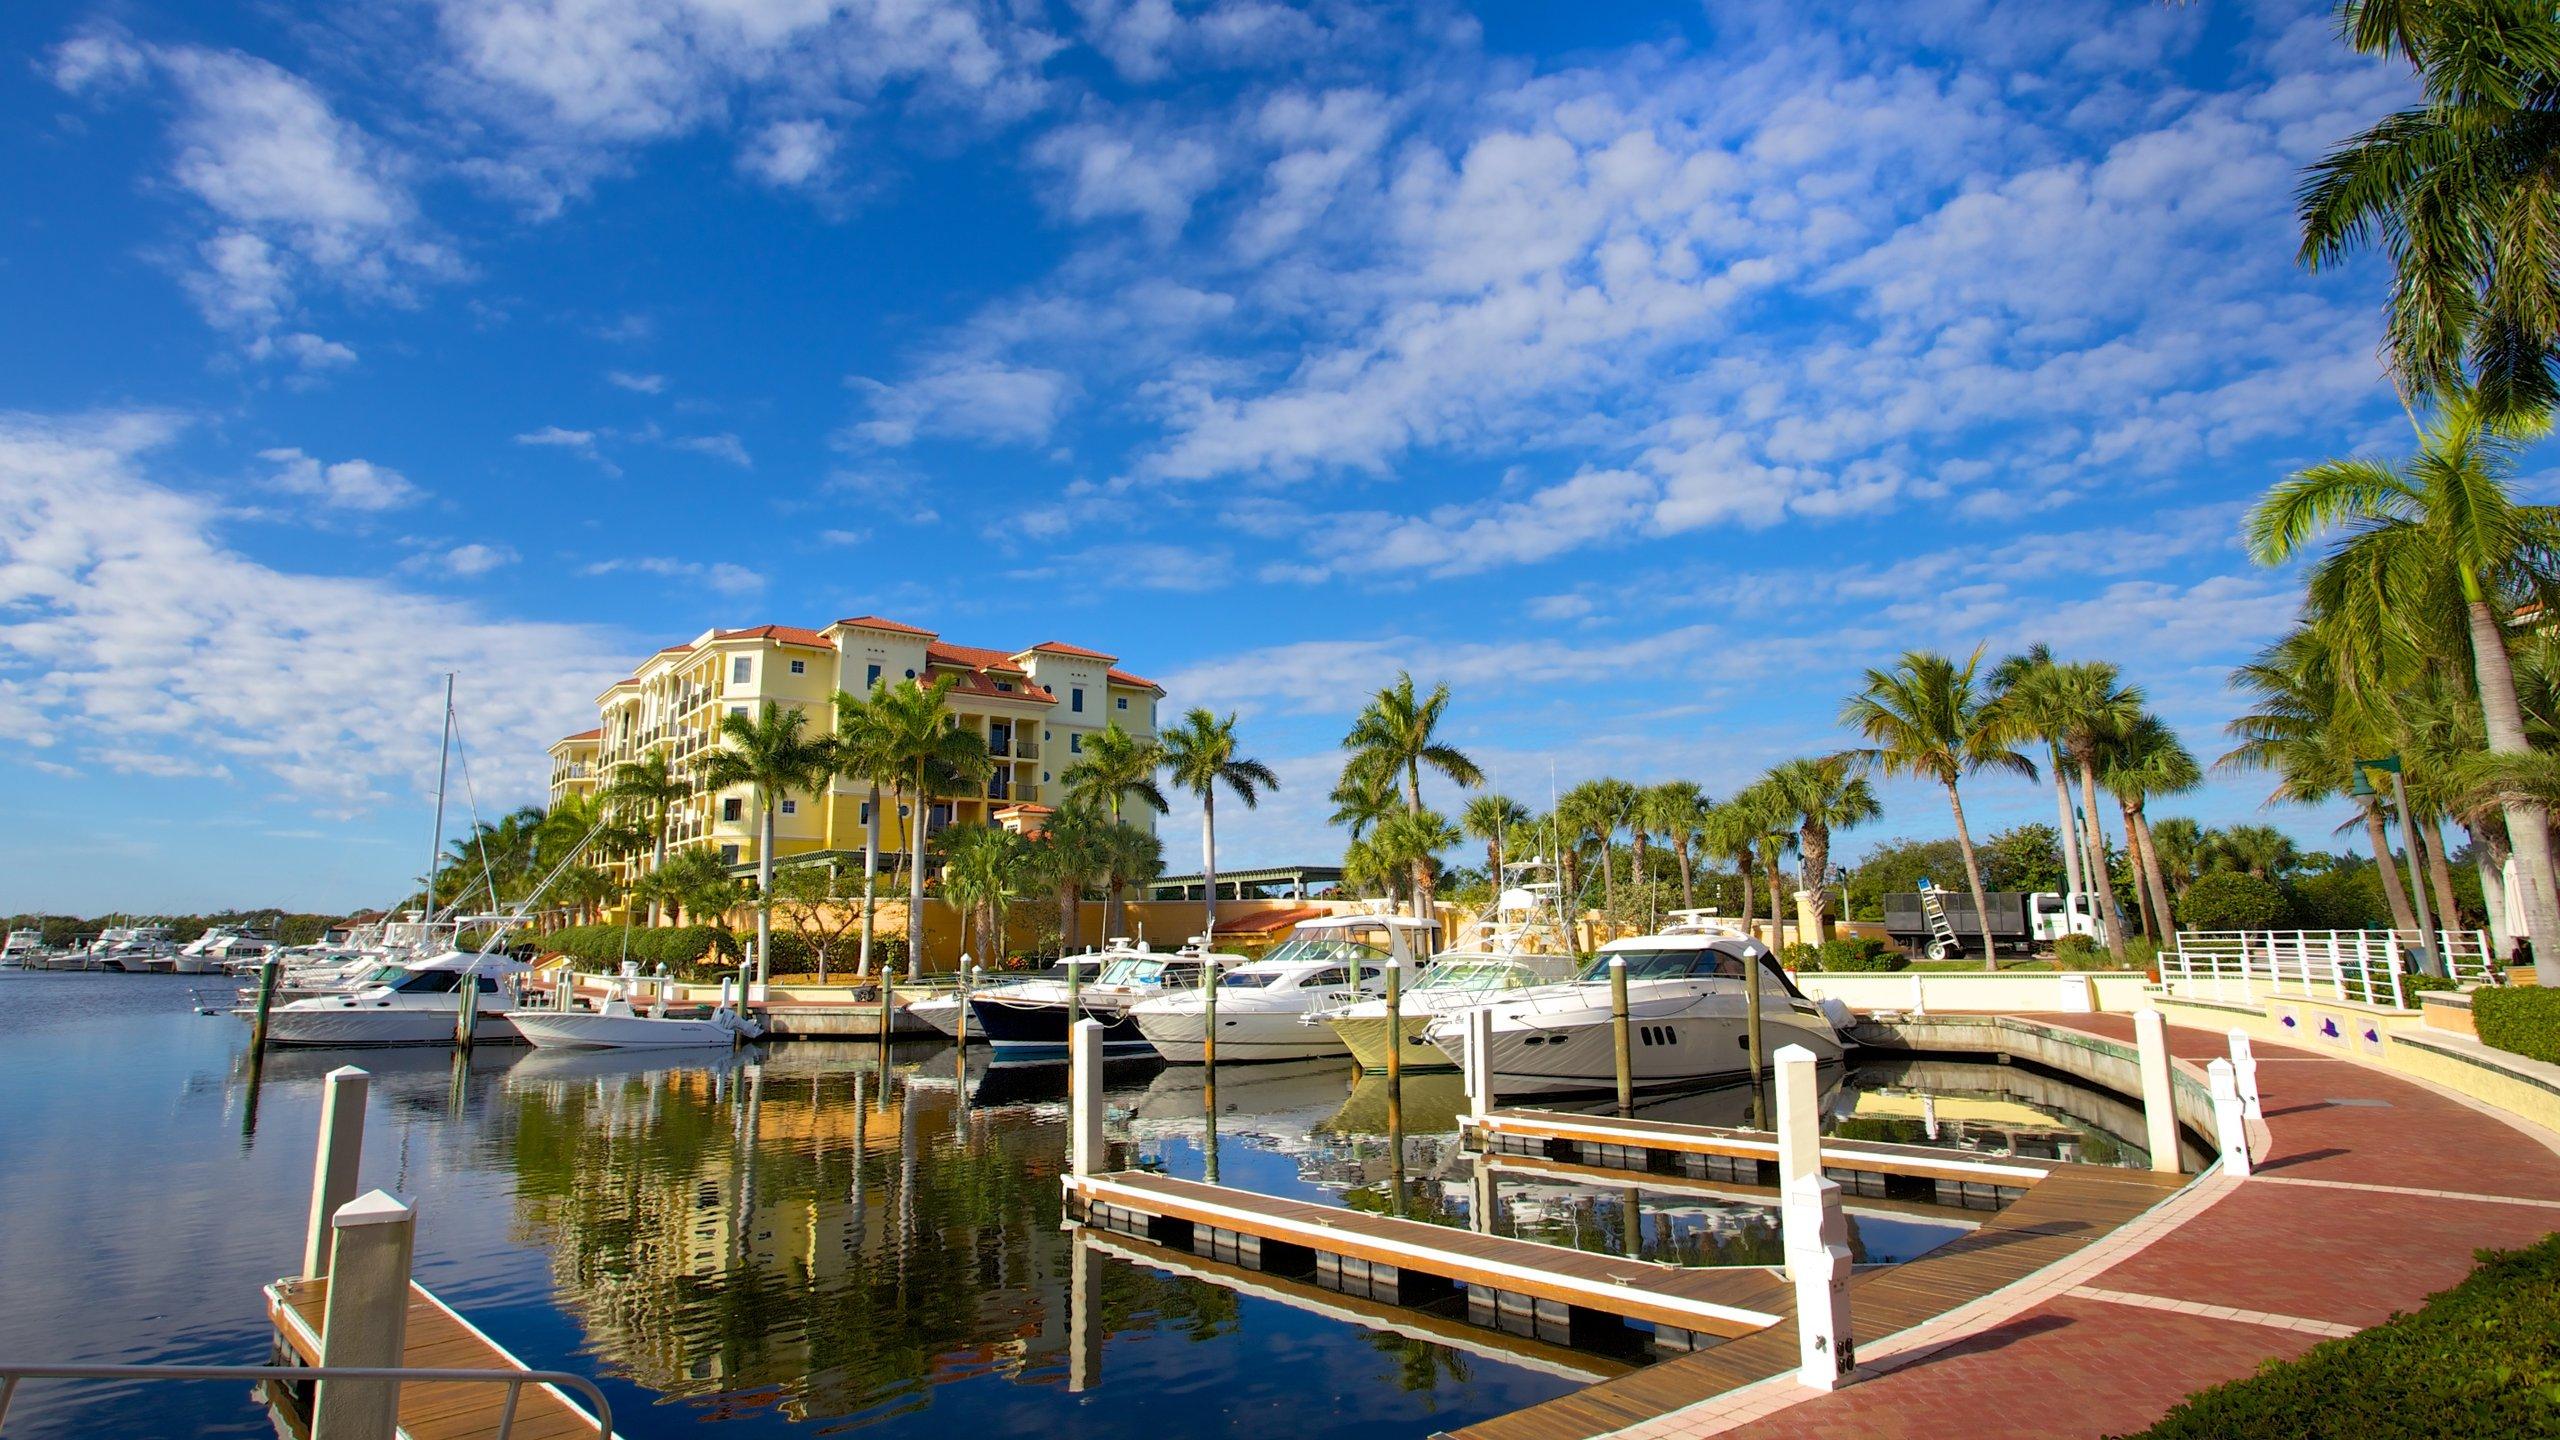 Jupiter, Florida, United States of America